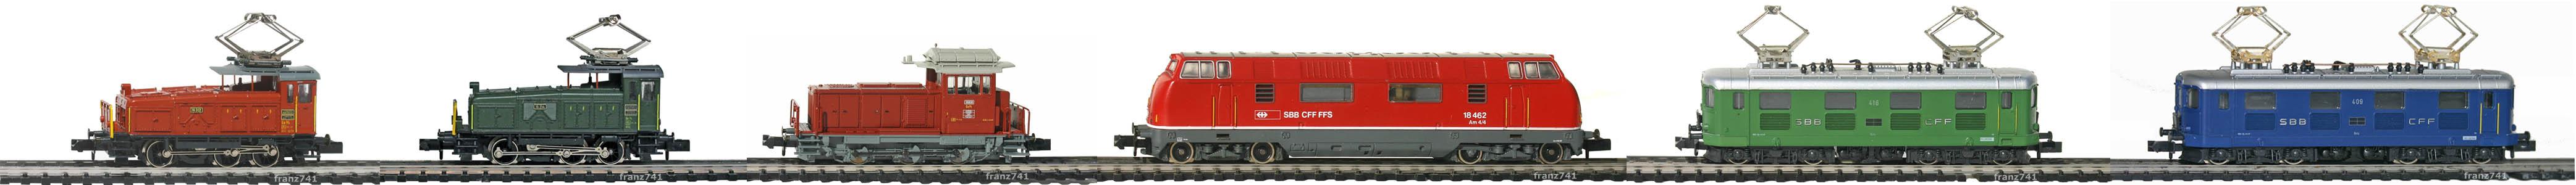 Epoche-II-III-SBB-Rangier-und-Prototypen-Loks